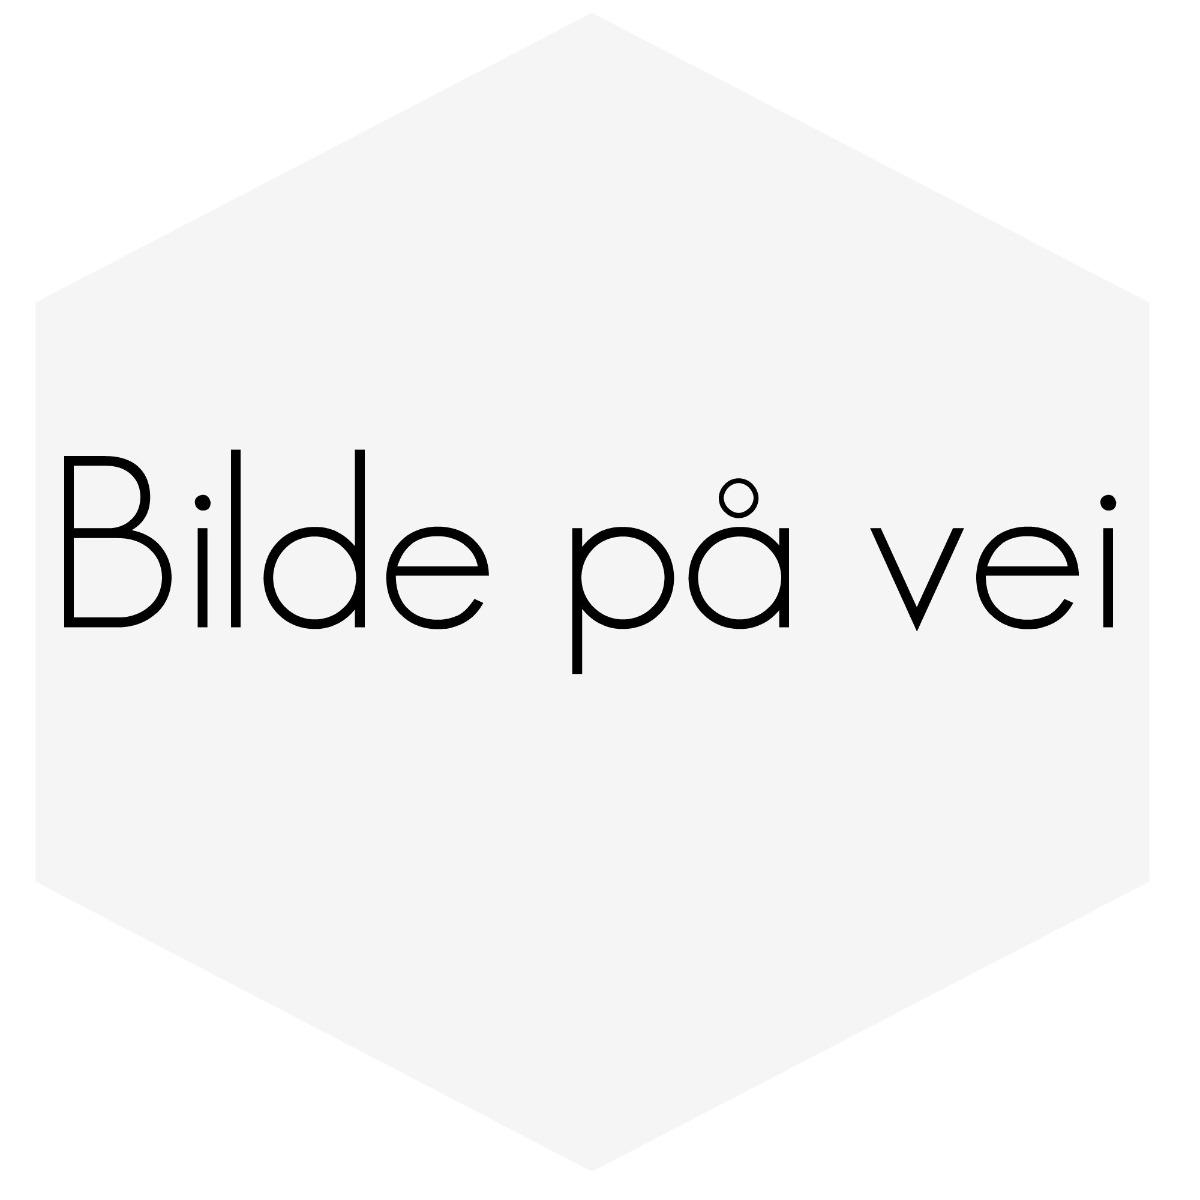 BREMSEBÅND HÅNDBREKK  Volvo S60/S80/V70N,XC70,XC90 272398